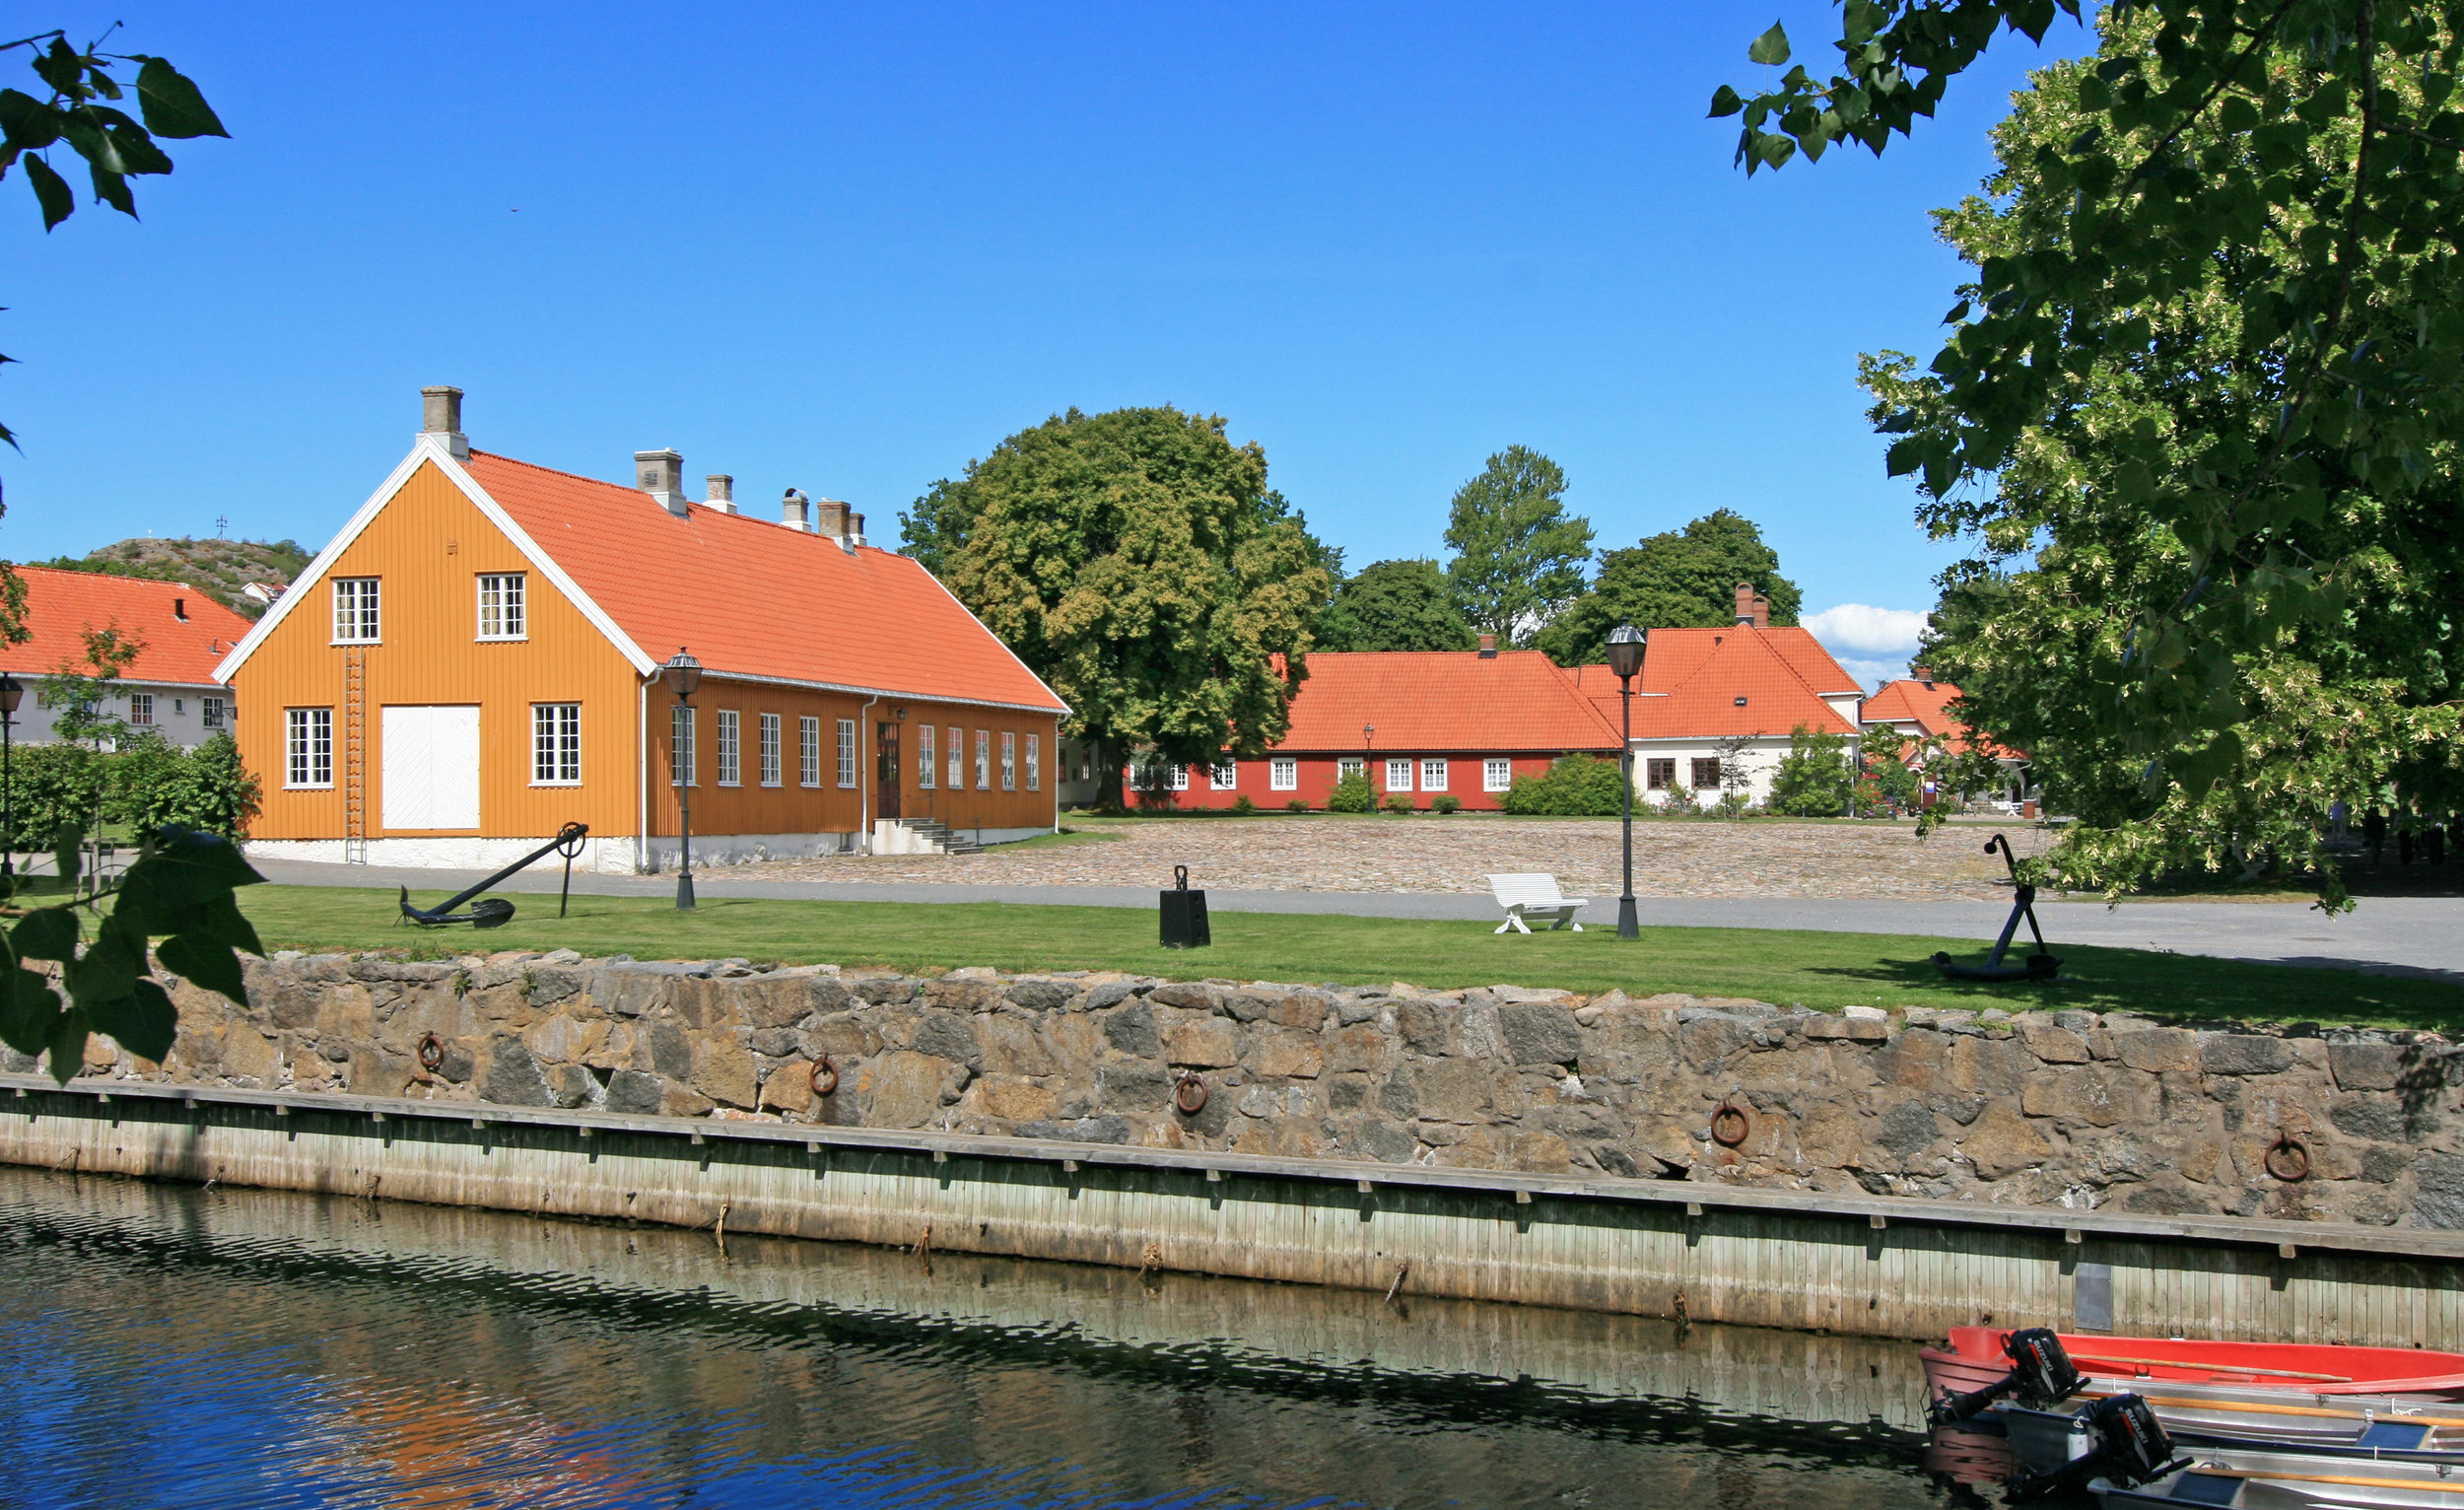 Stavern_Fredriksvern.jpg